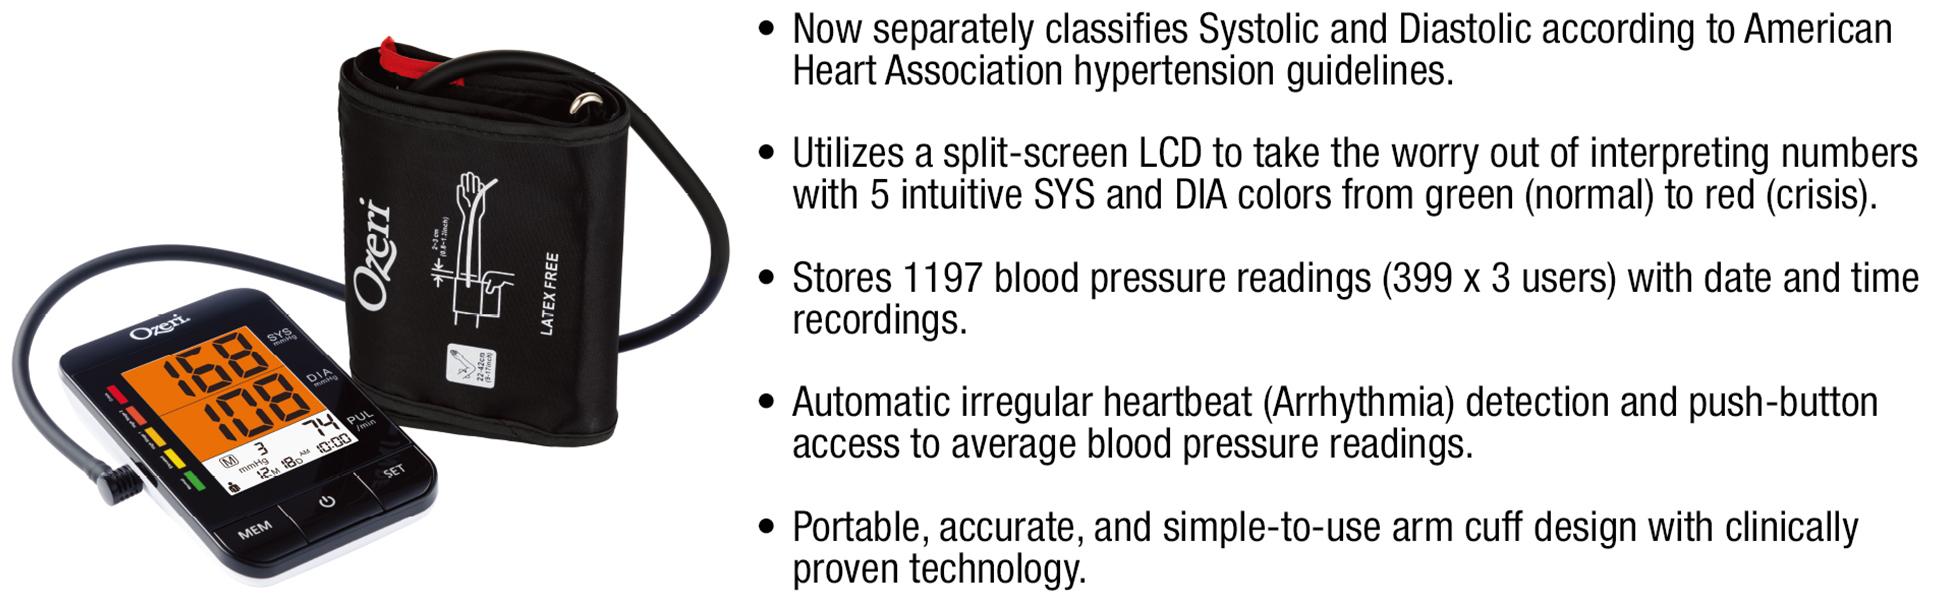 Ozeri BP9W Arm Blood Pressure Monitor with Split-Screen Hypertension Color Alert Technology